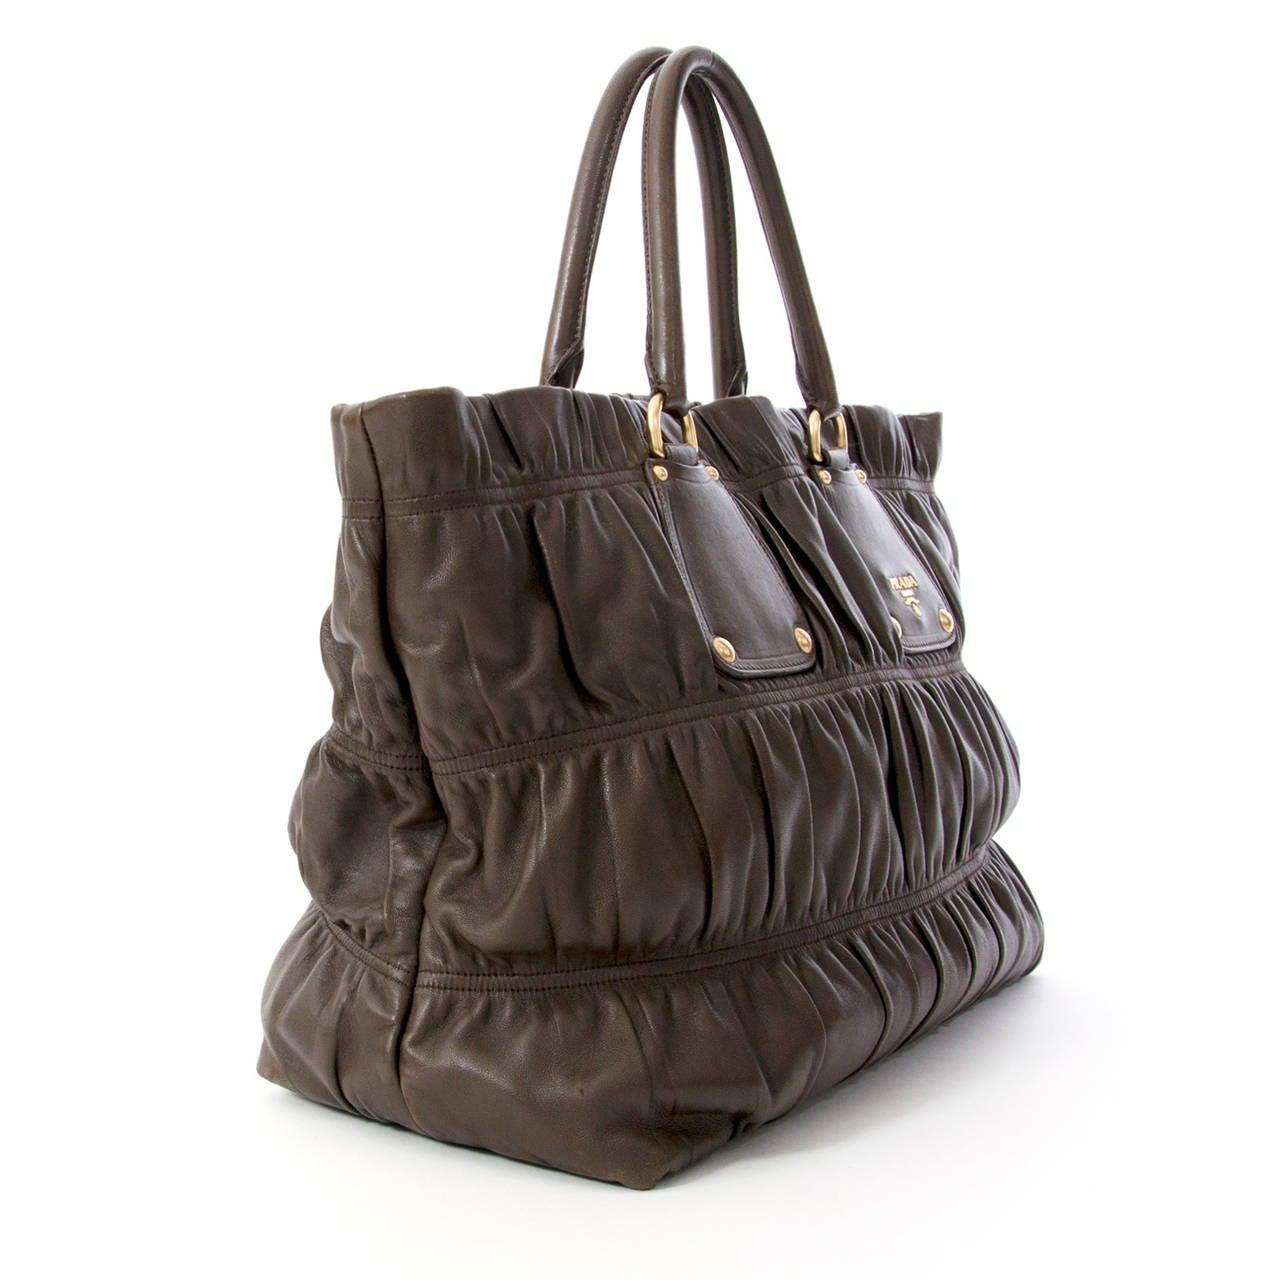 Prada Brown Gaufre Bag at 1stdibs